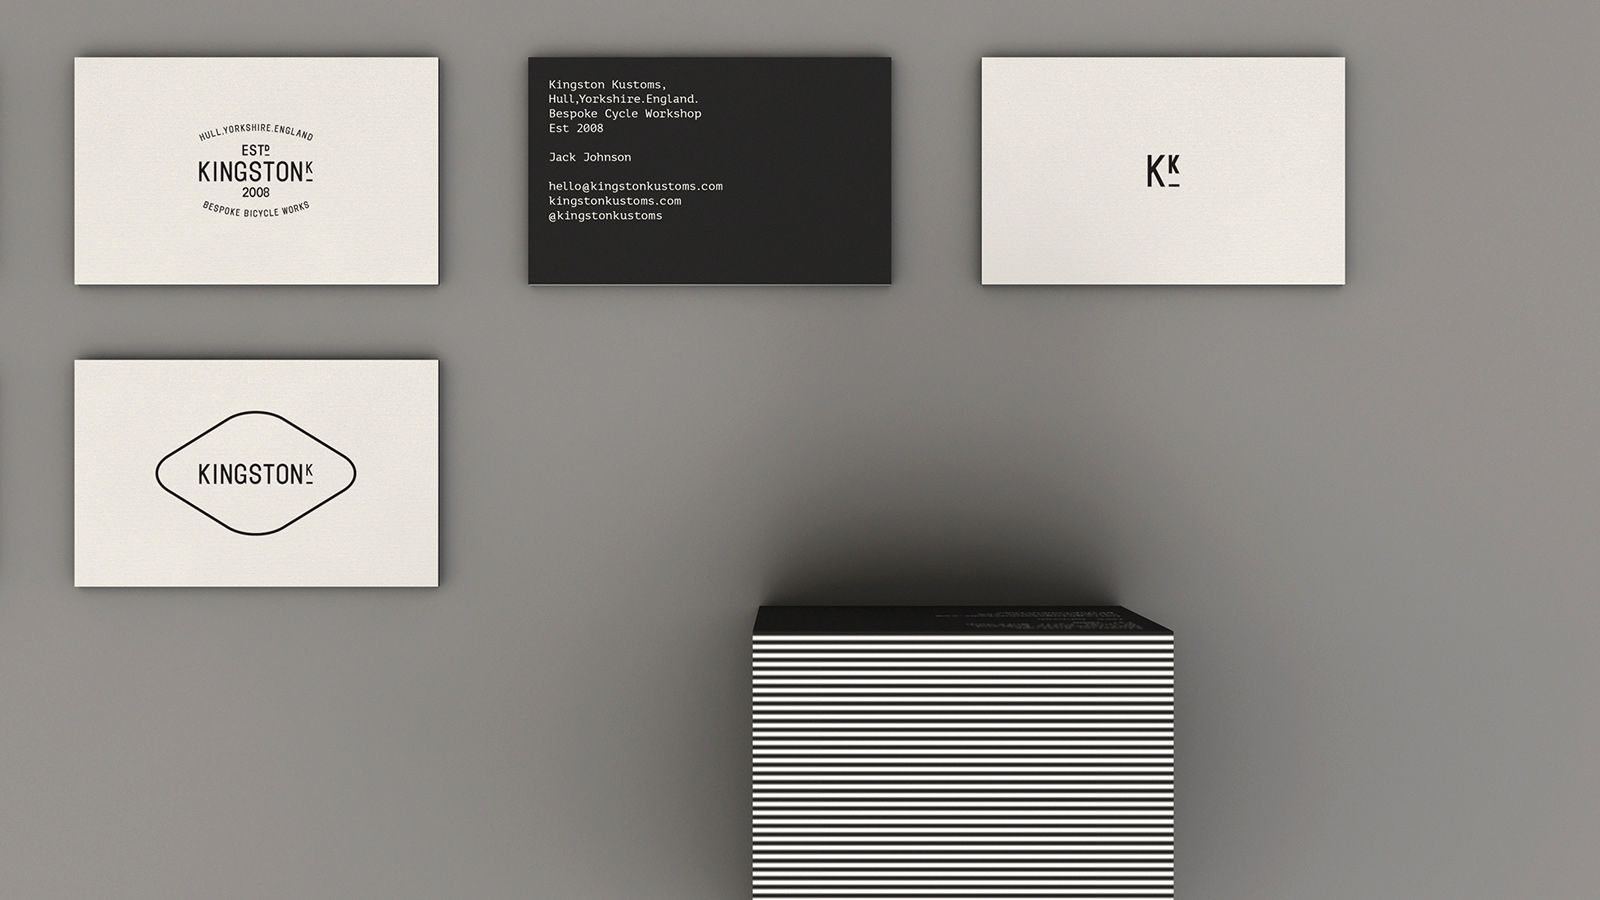 Kingston Kustoms | Studio Contents | typography | Pinterest ...